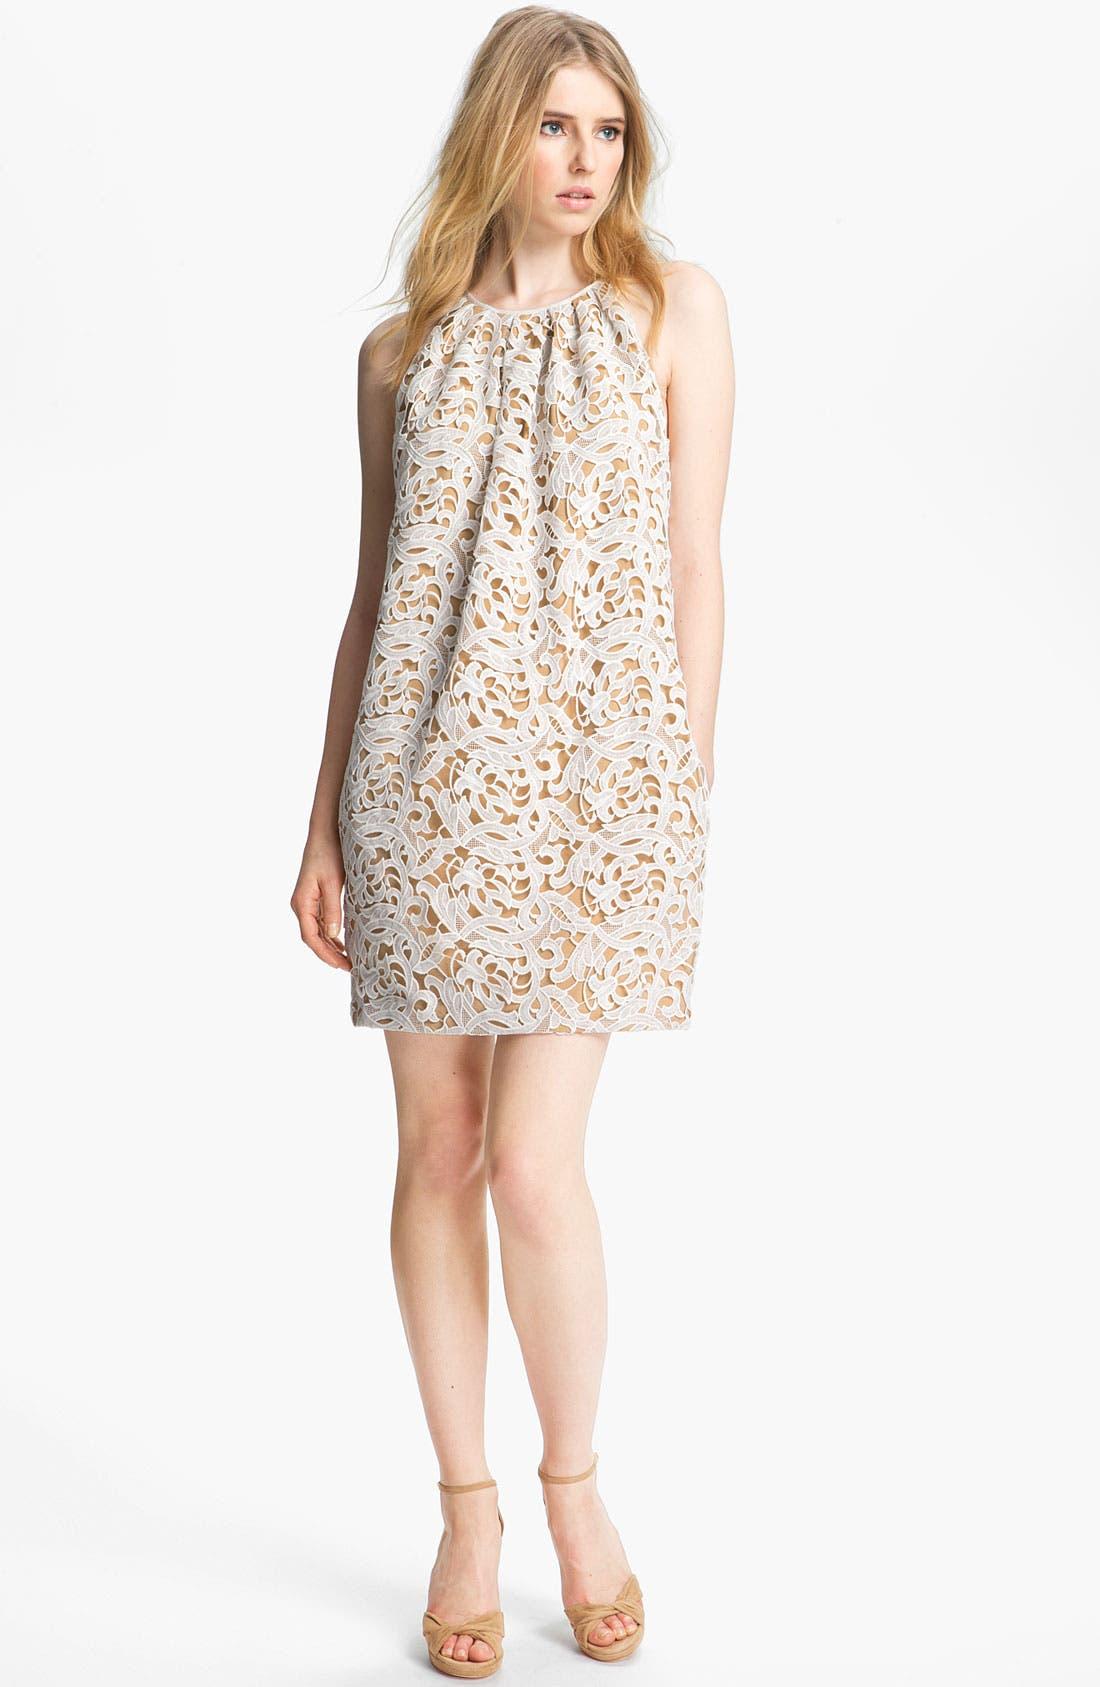 Alternate Image 1 Selected - Jay Godfrey 'Lowell' Lace Shift Dress